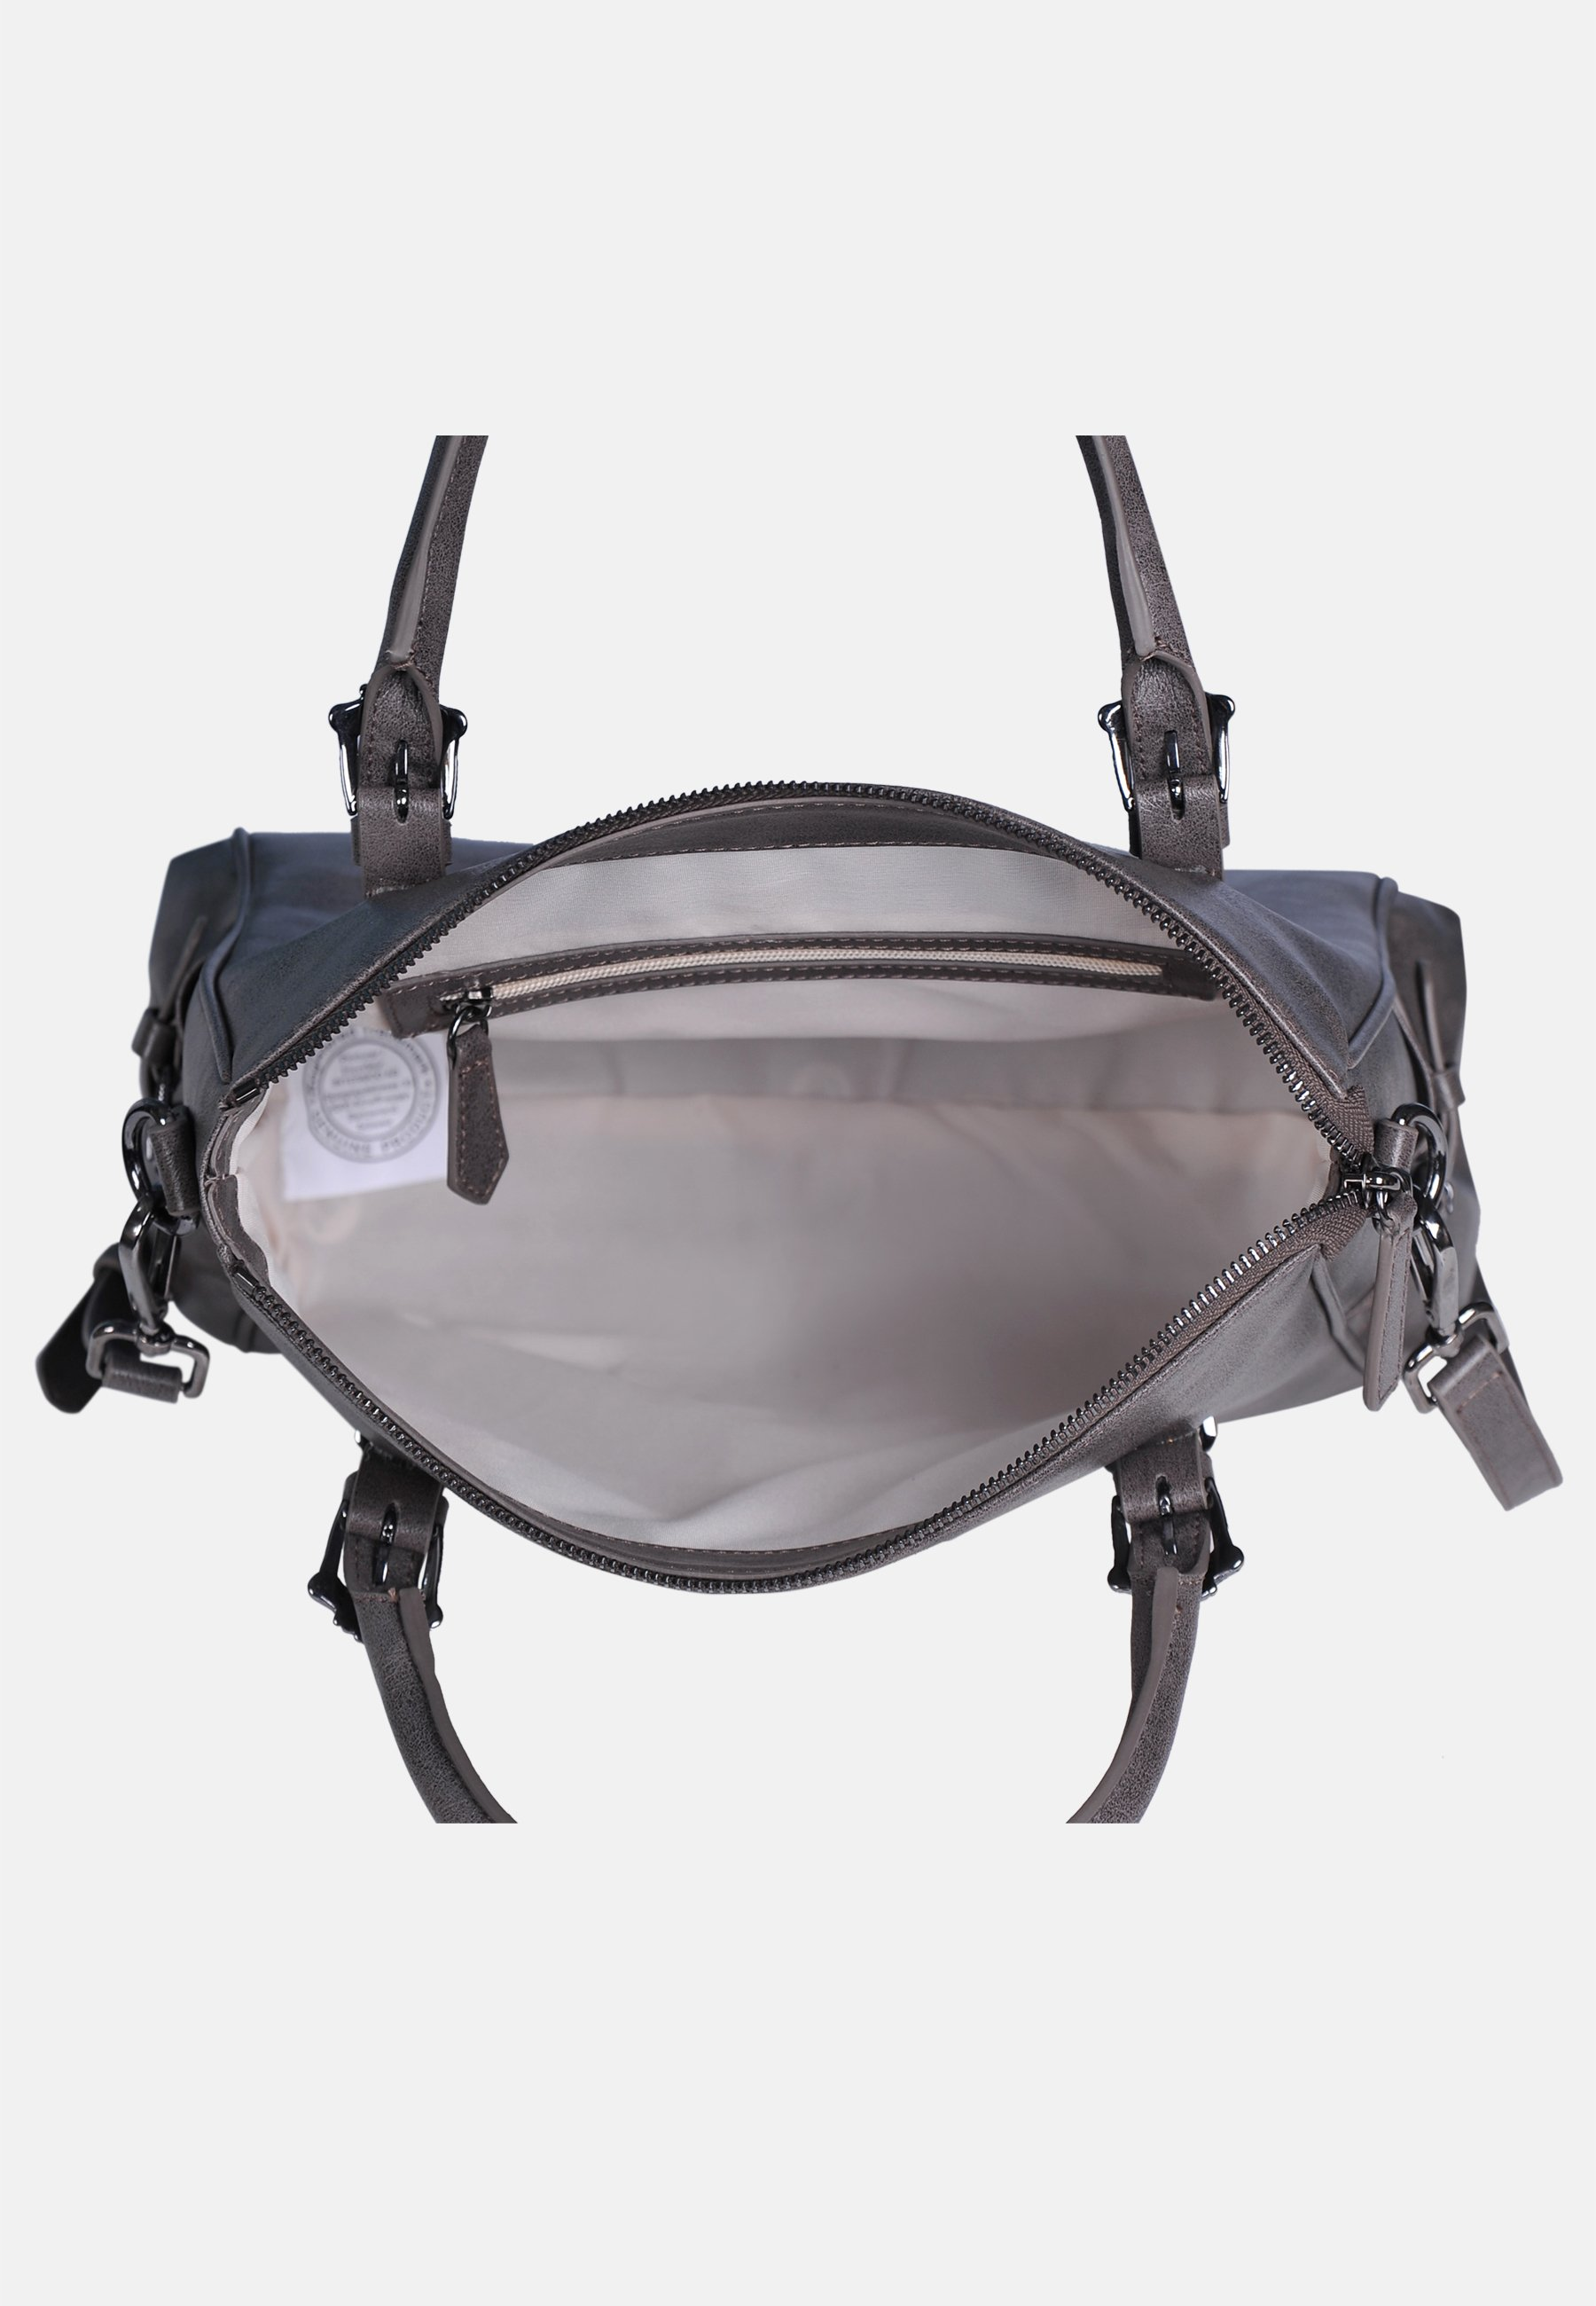 2020 Newest Best Supplier Accessories Silvio Tossi Handbag dunkelgrau aZndn8GT4 klo2W8A7z